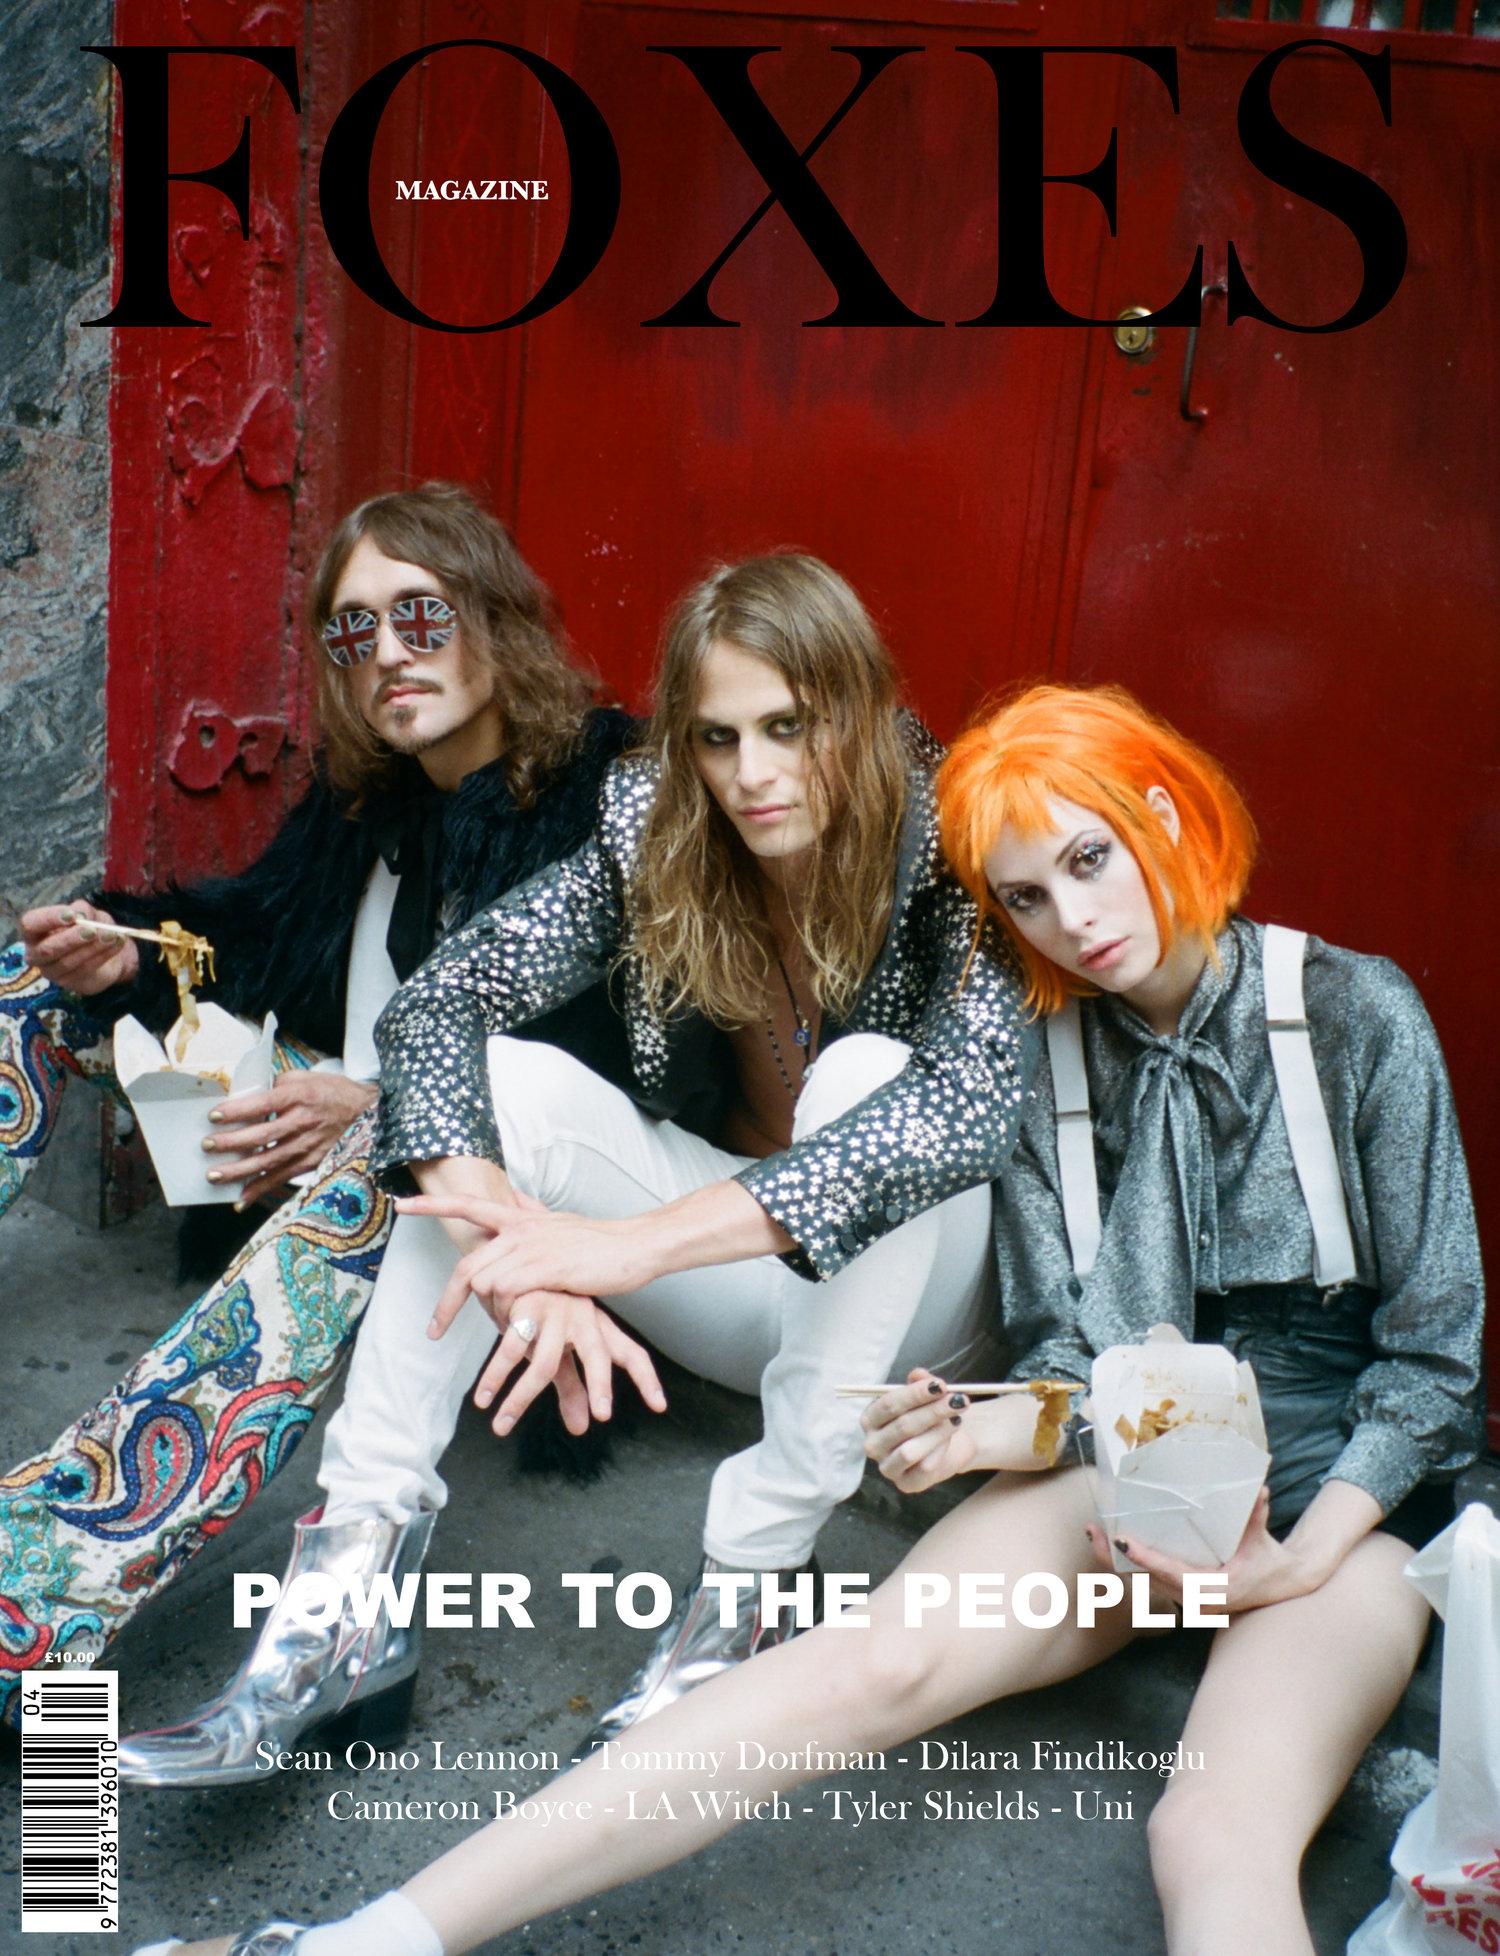 FOXES_MAGAZINE_UNI_COVER.jpg